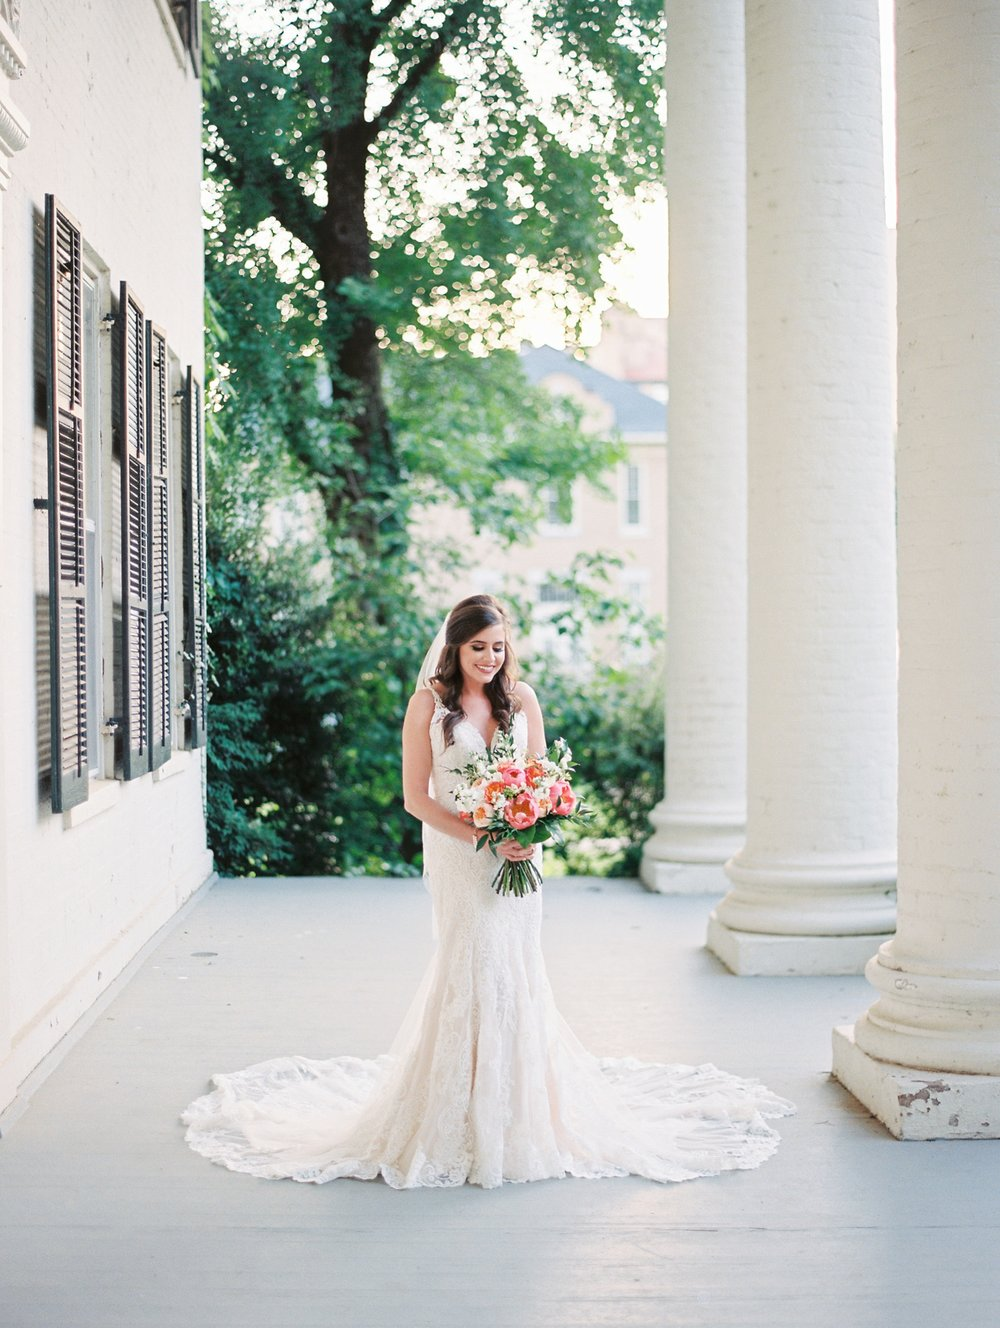 The-Terry-House-Wedding-Little-Rock-Arkansas_0077.jpg